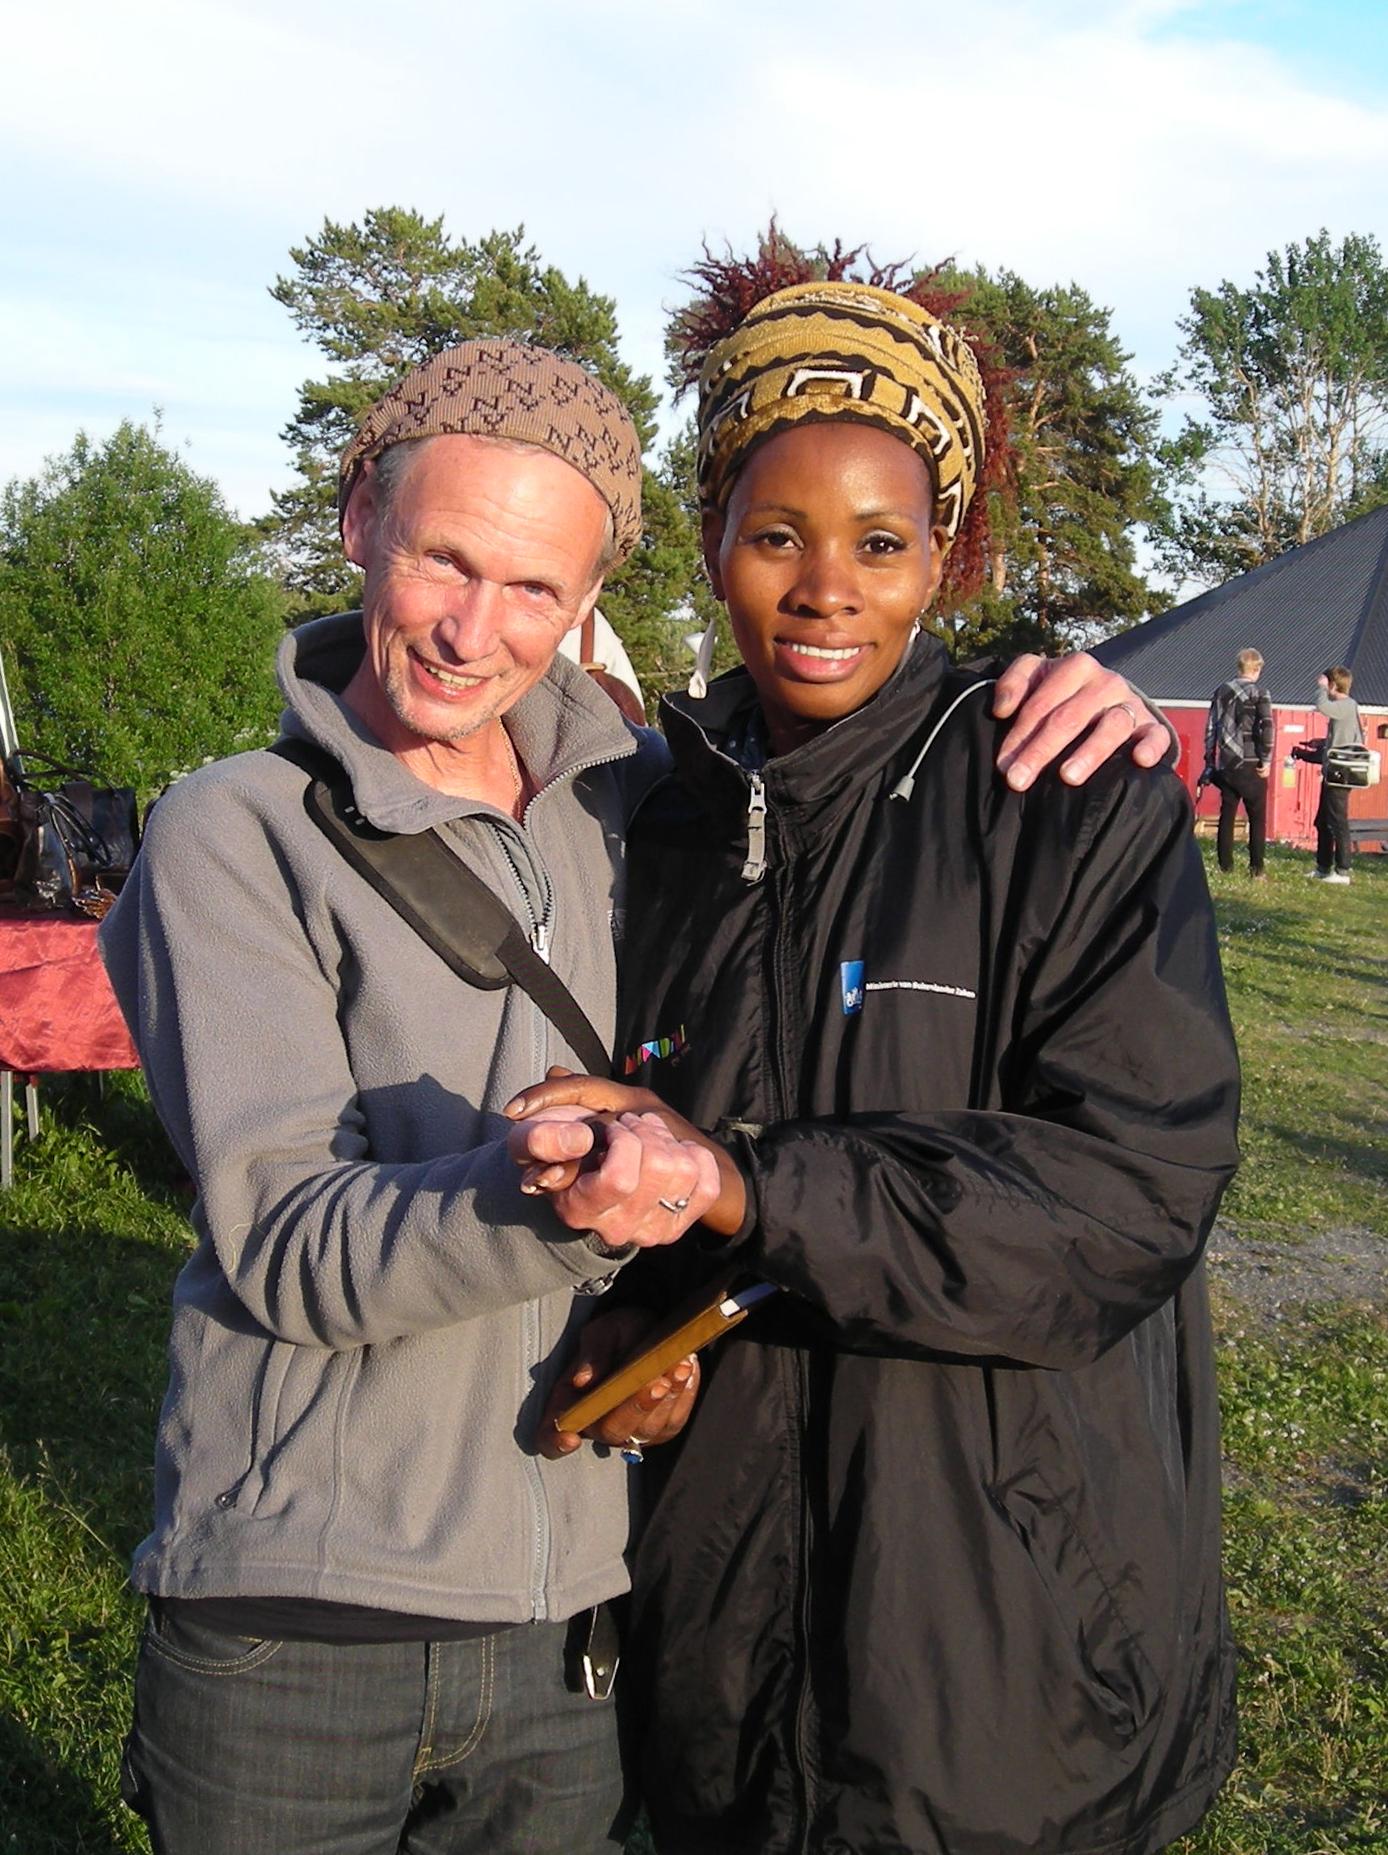 MaliHåkan and MaliSadio (Sidibe) at the Sweden/Mali voices festival, Fröjdholmen 2010